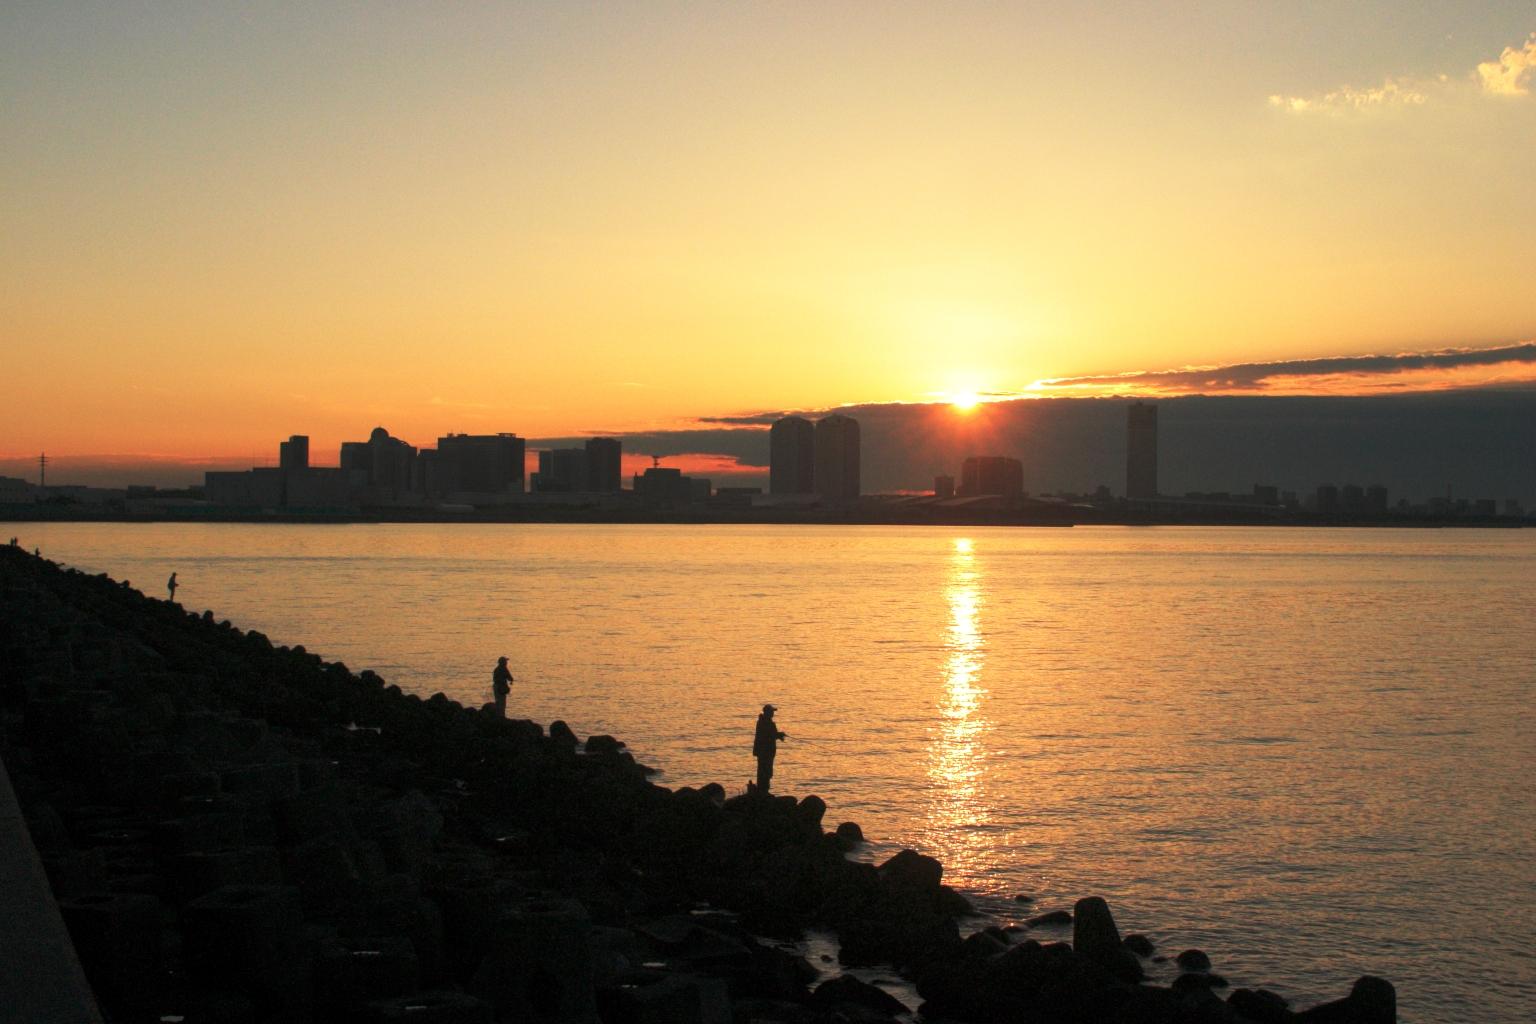 東京湾の夜明